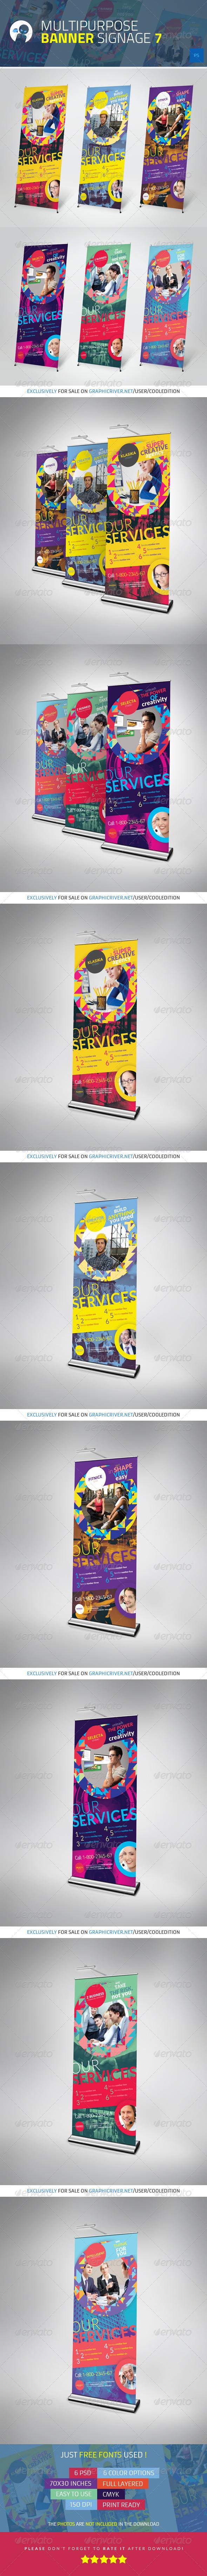 GraphicRiver Multipurpose Banner Signage 7 4013102